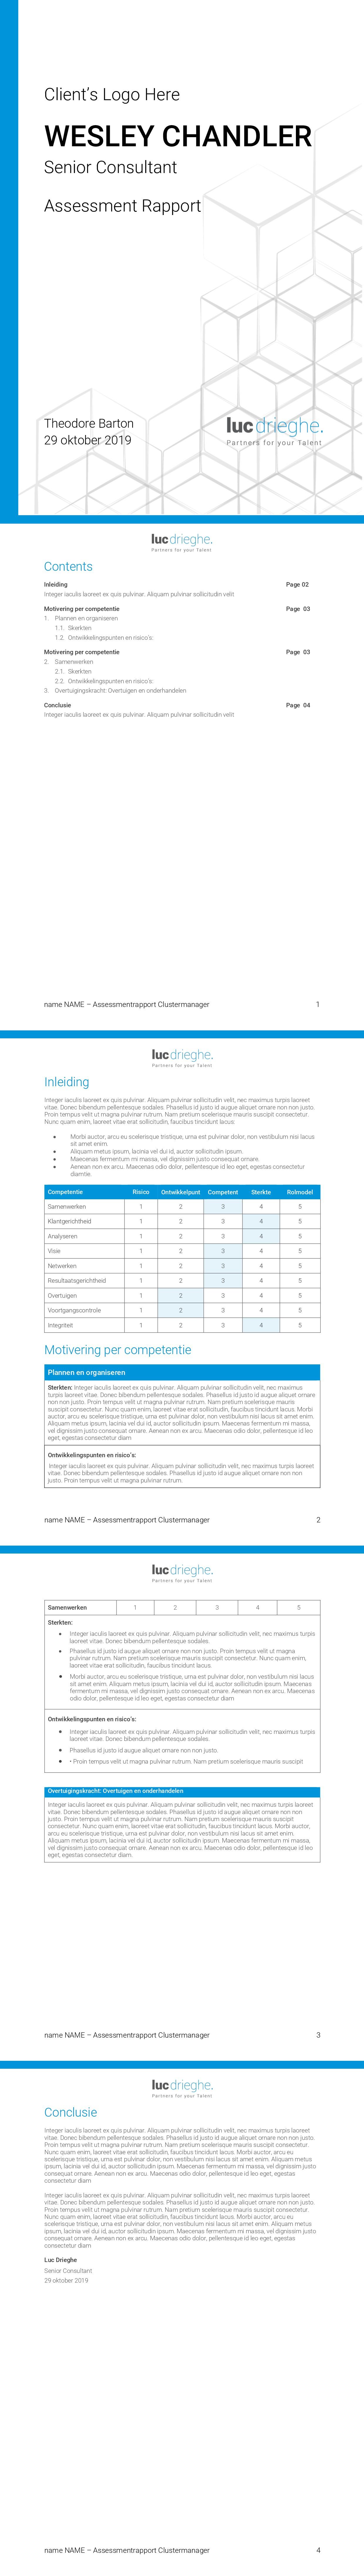 Word-template voor HR-adviesbureau